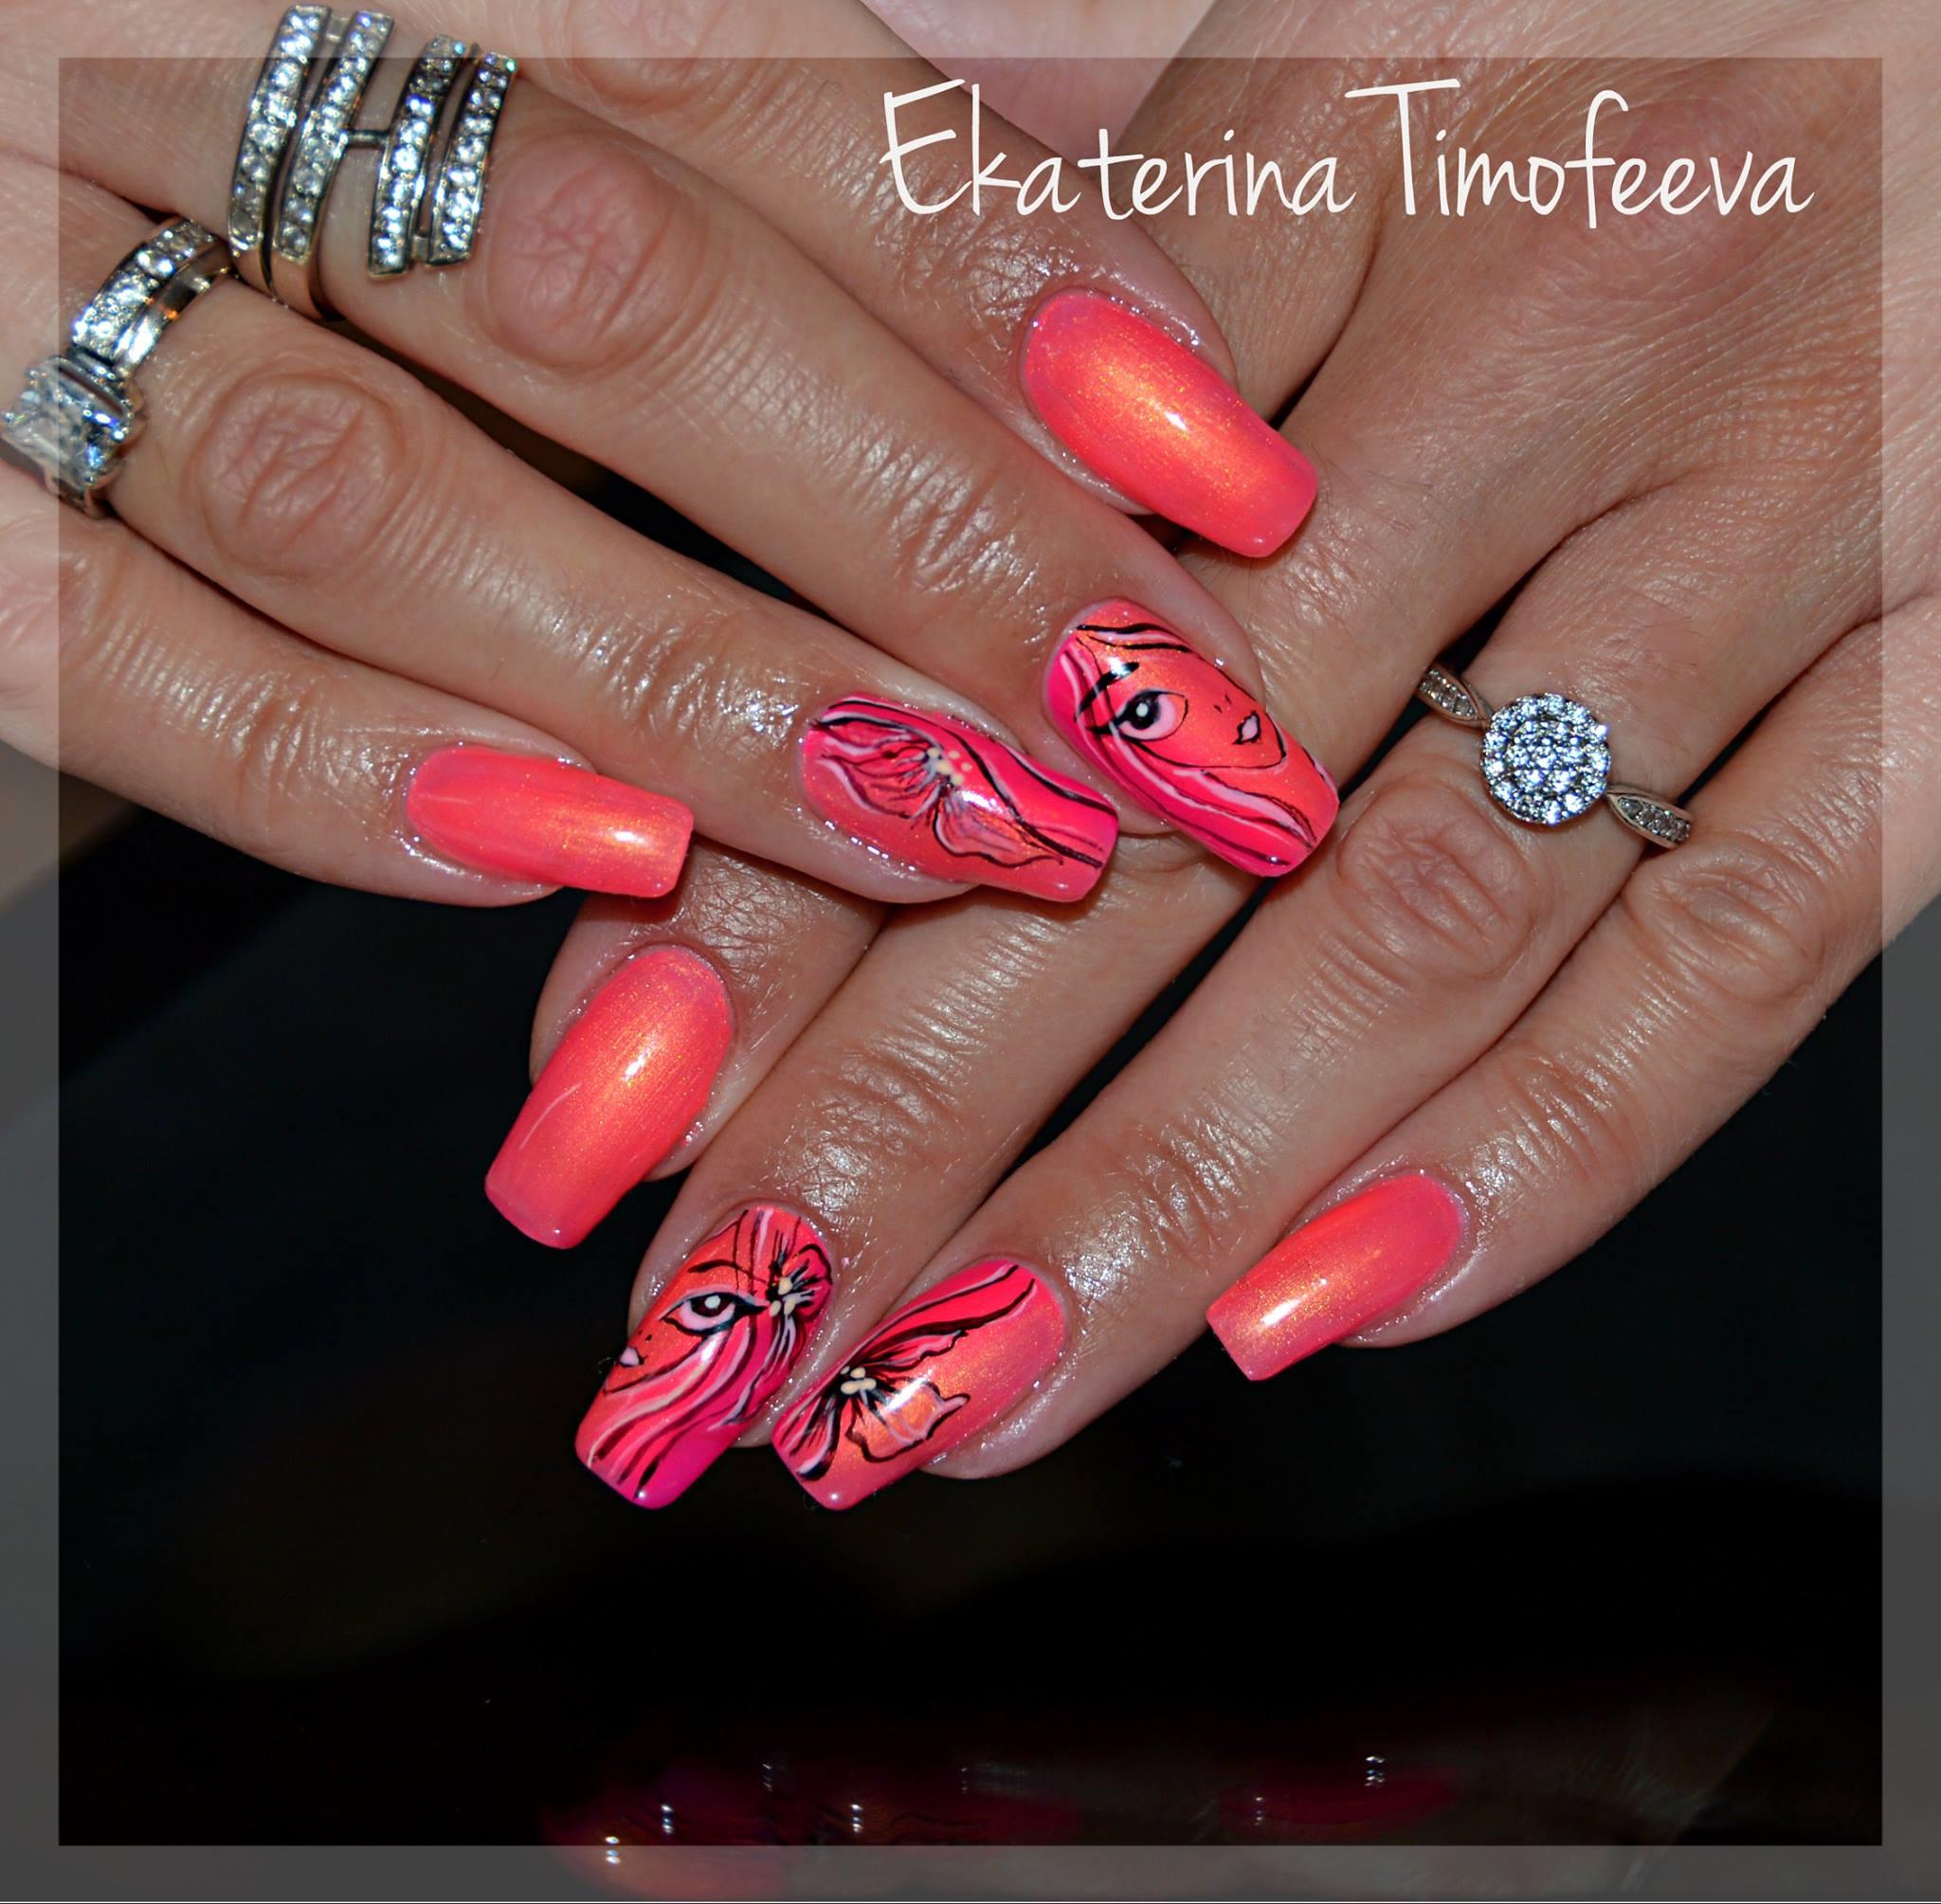 Guest nail art 18 best nail art designs gallery bestartnails summer nails prinsesfo Choice Image